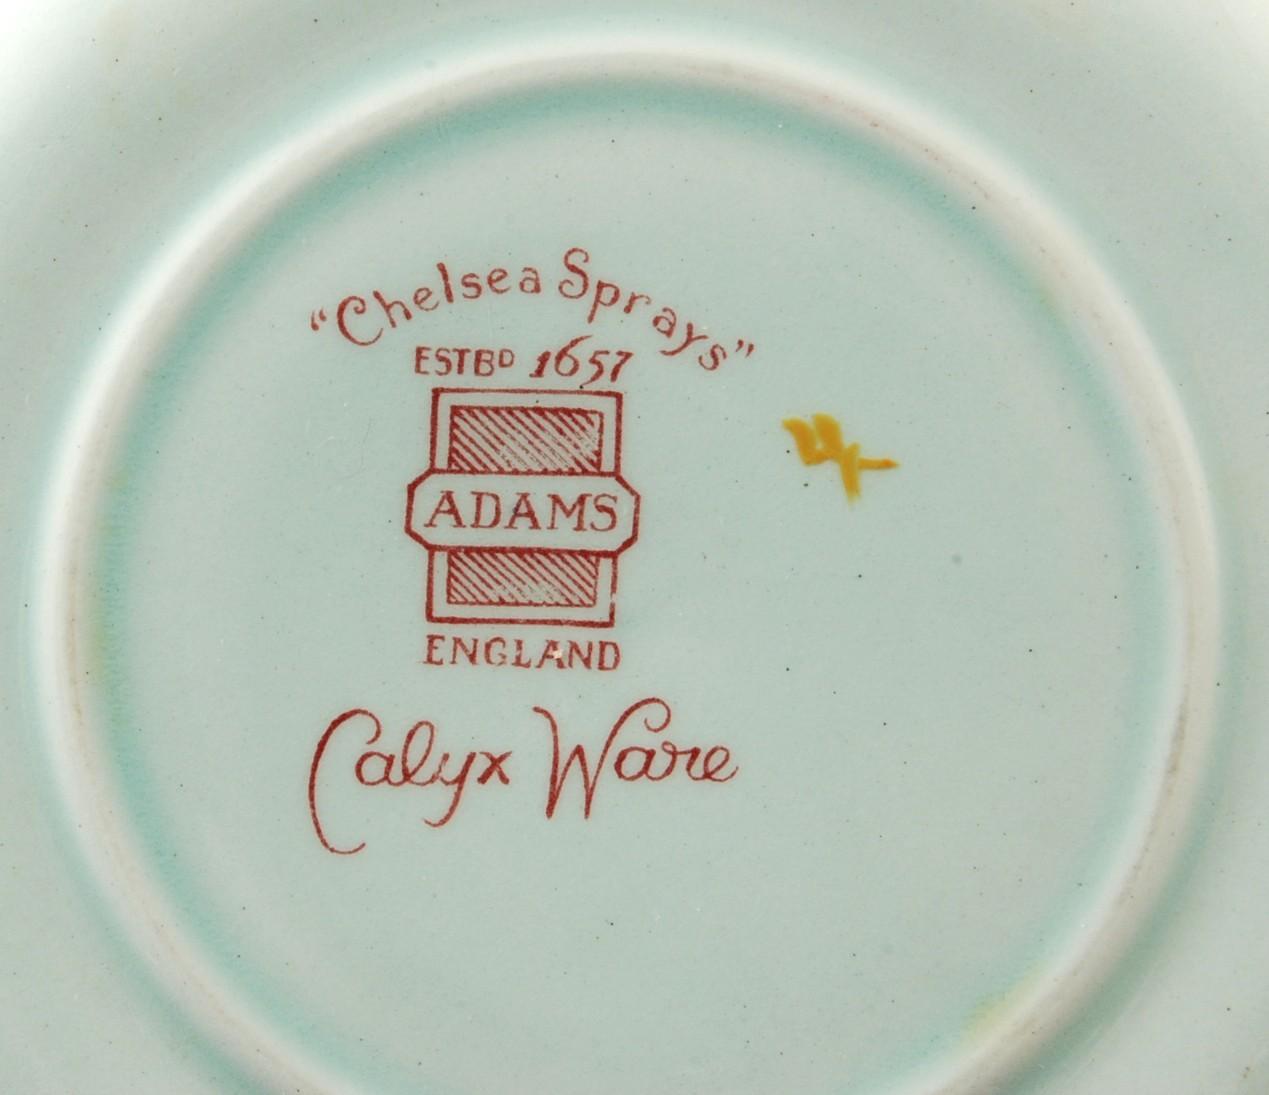 Adams China Chelsea Sprays Blue Octagonal Saucers Calyx Ware